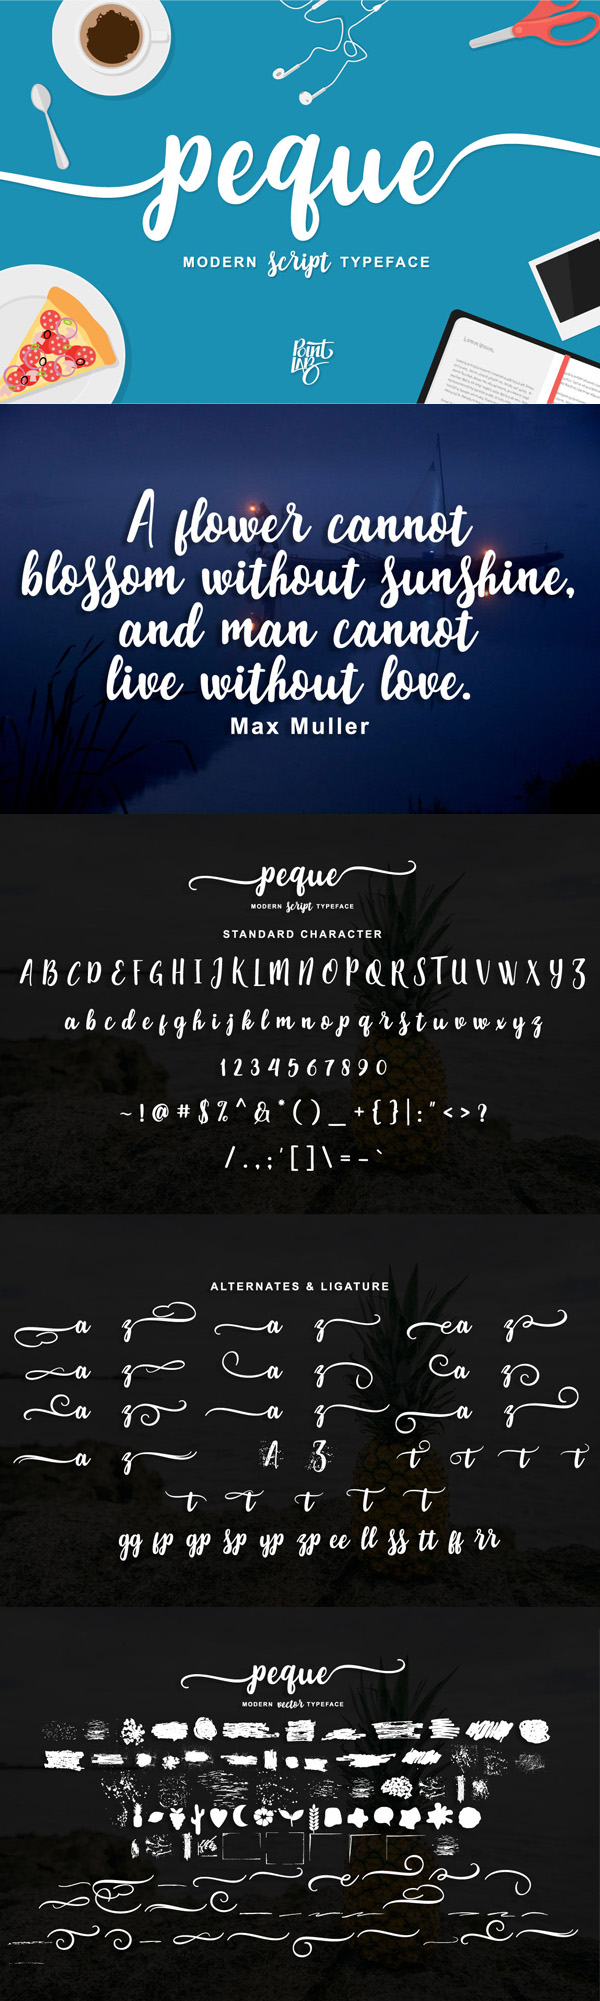 Peque Free Script Font